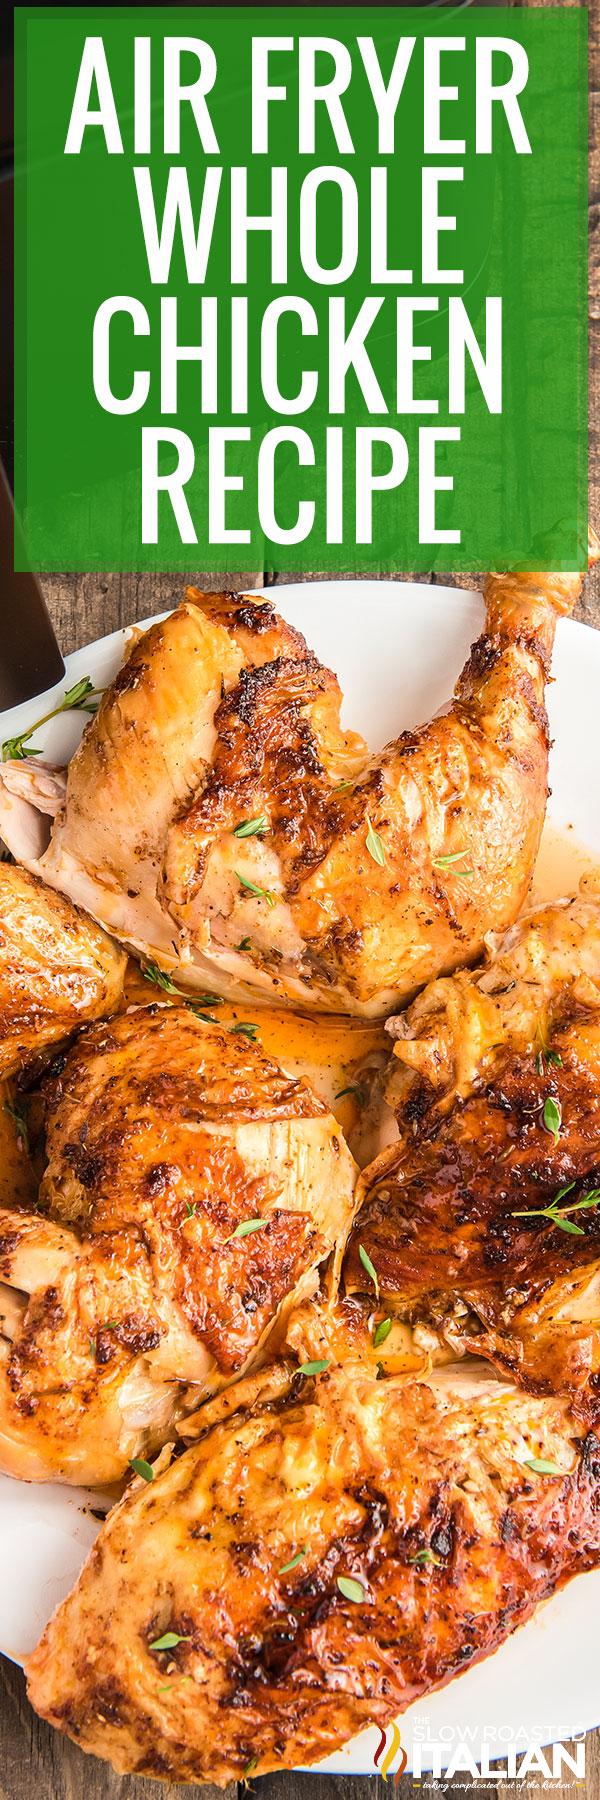 Cut air fryer whole chicken